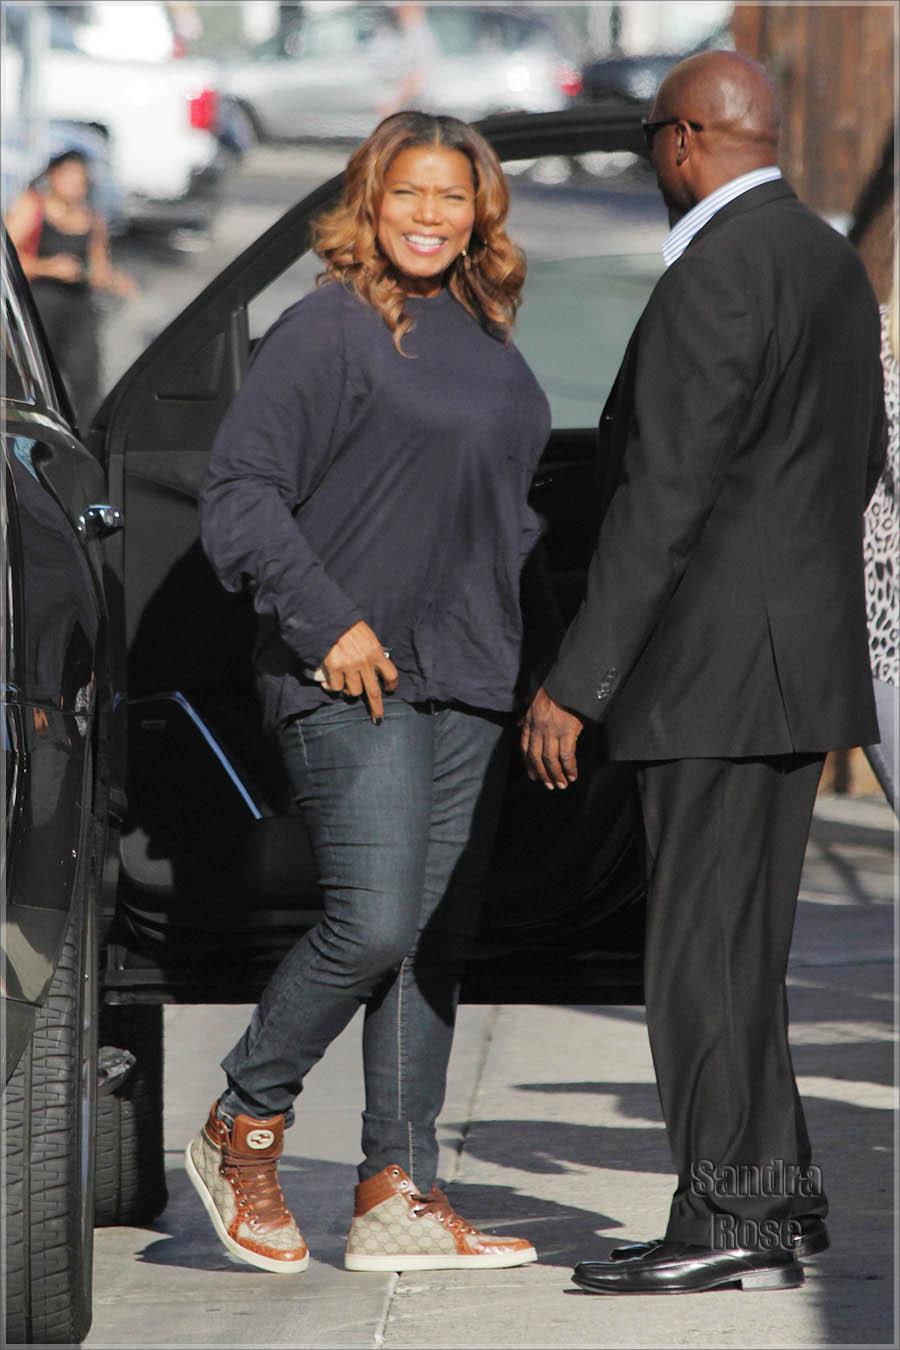 Queen Latifah arriving at Jimmy Kimmel Live!